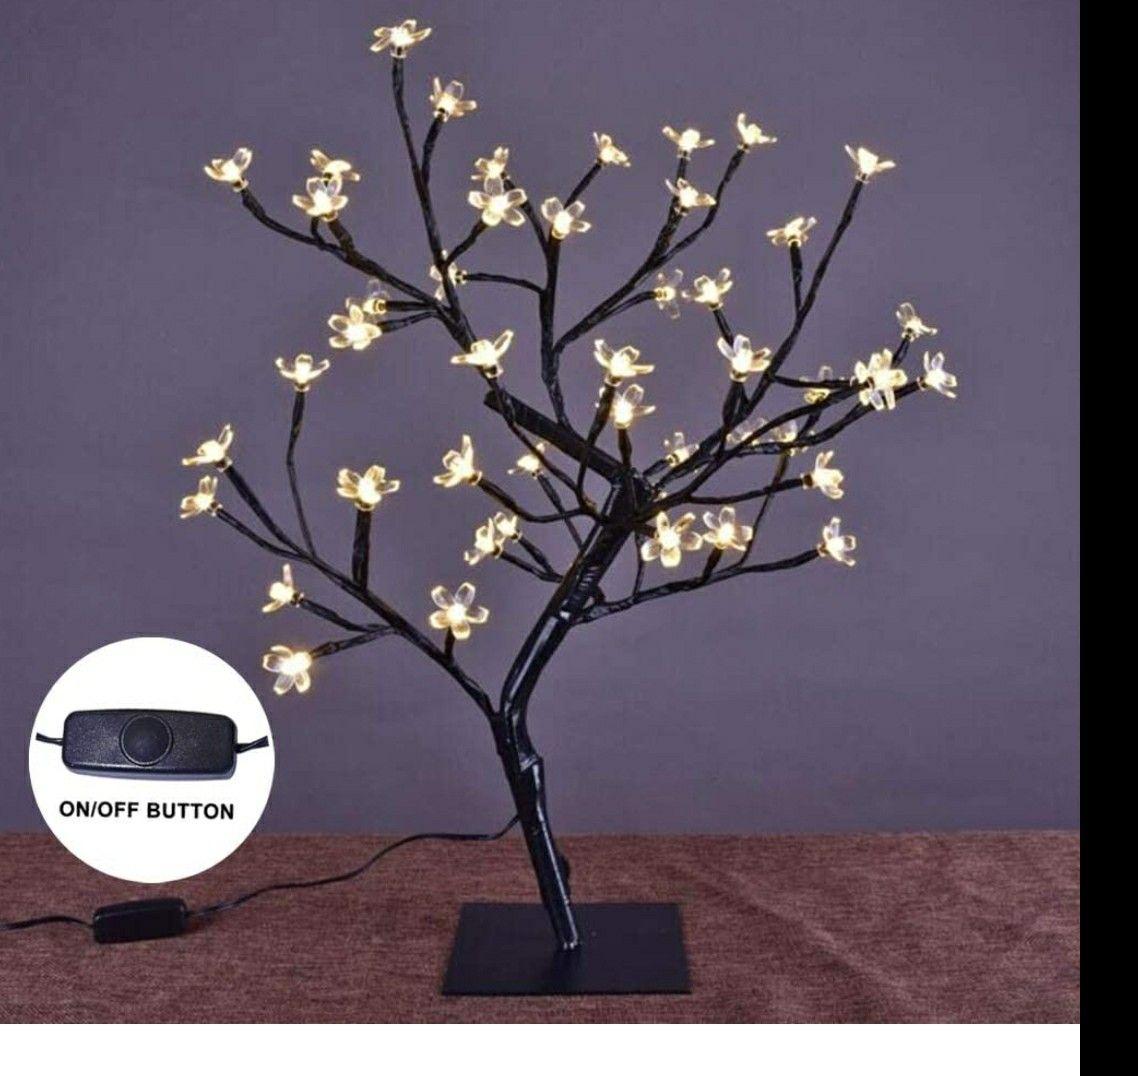 Lightshare Tree Cherry Blossom Bonsai Tree Bonsai Tree Led Lights